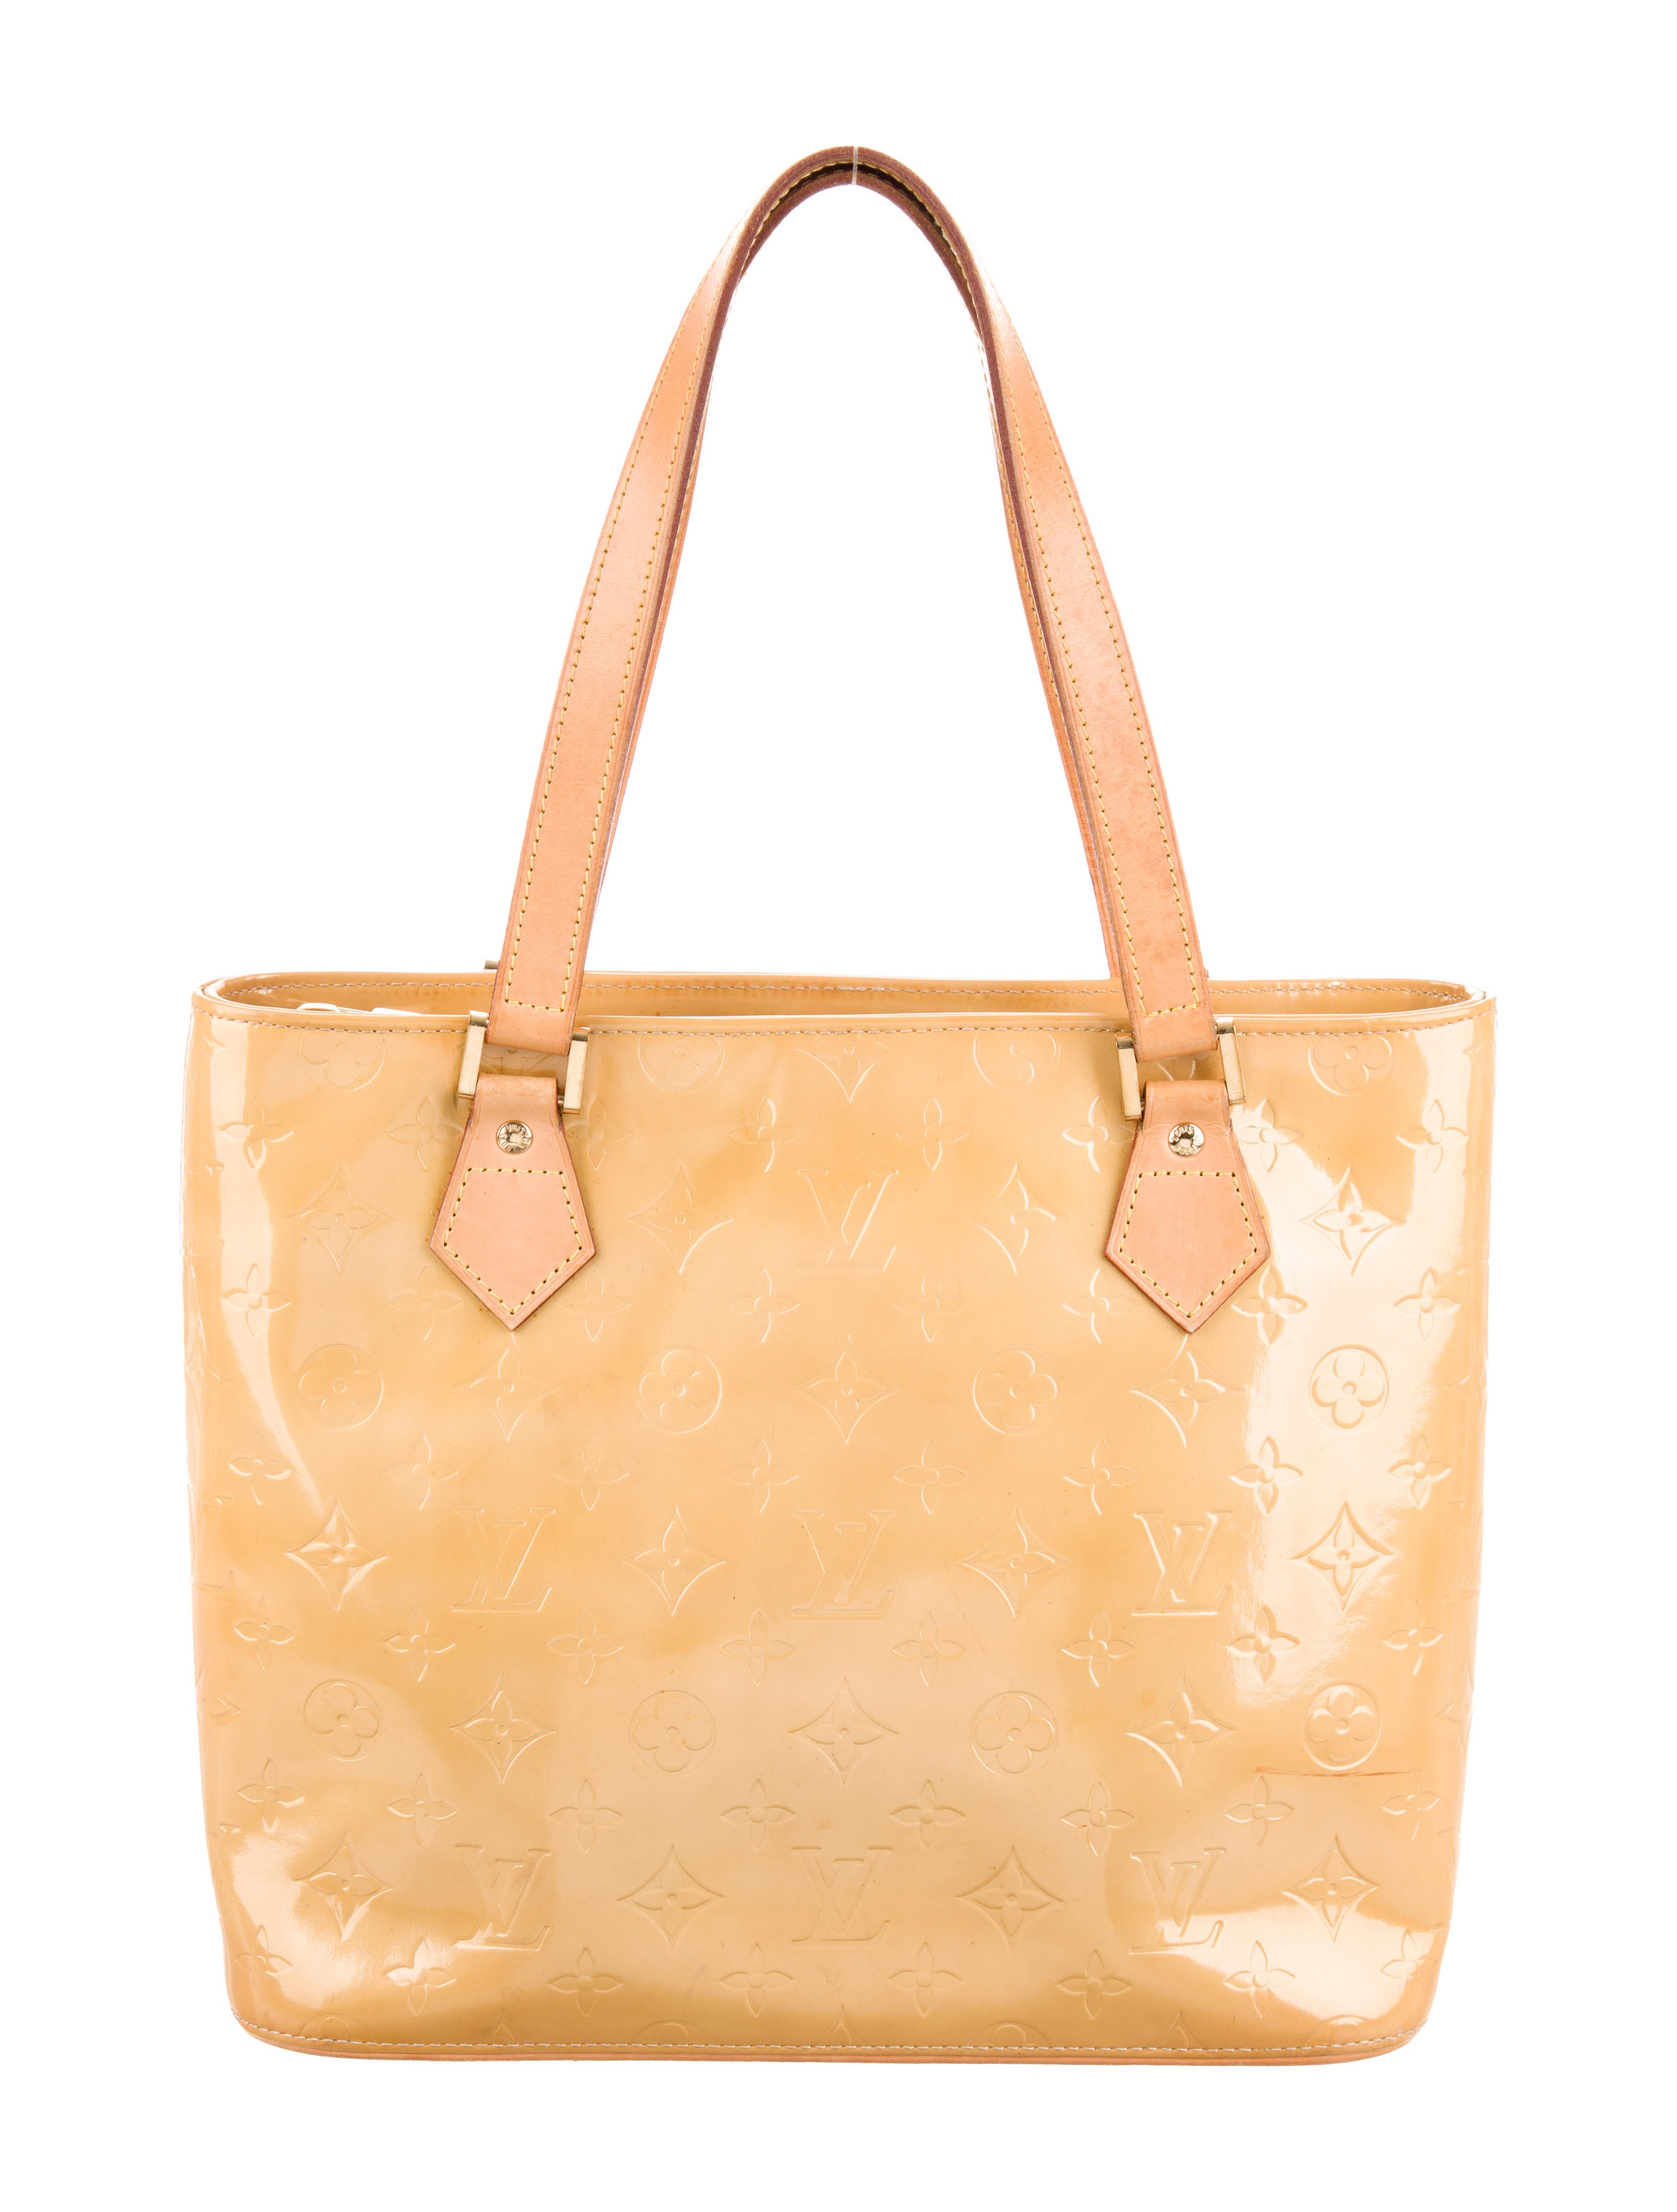 587d54c73 Louis Vuitton Vernis Houston Tote - Handbags - LOU213021 | The RealReal